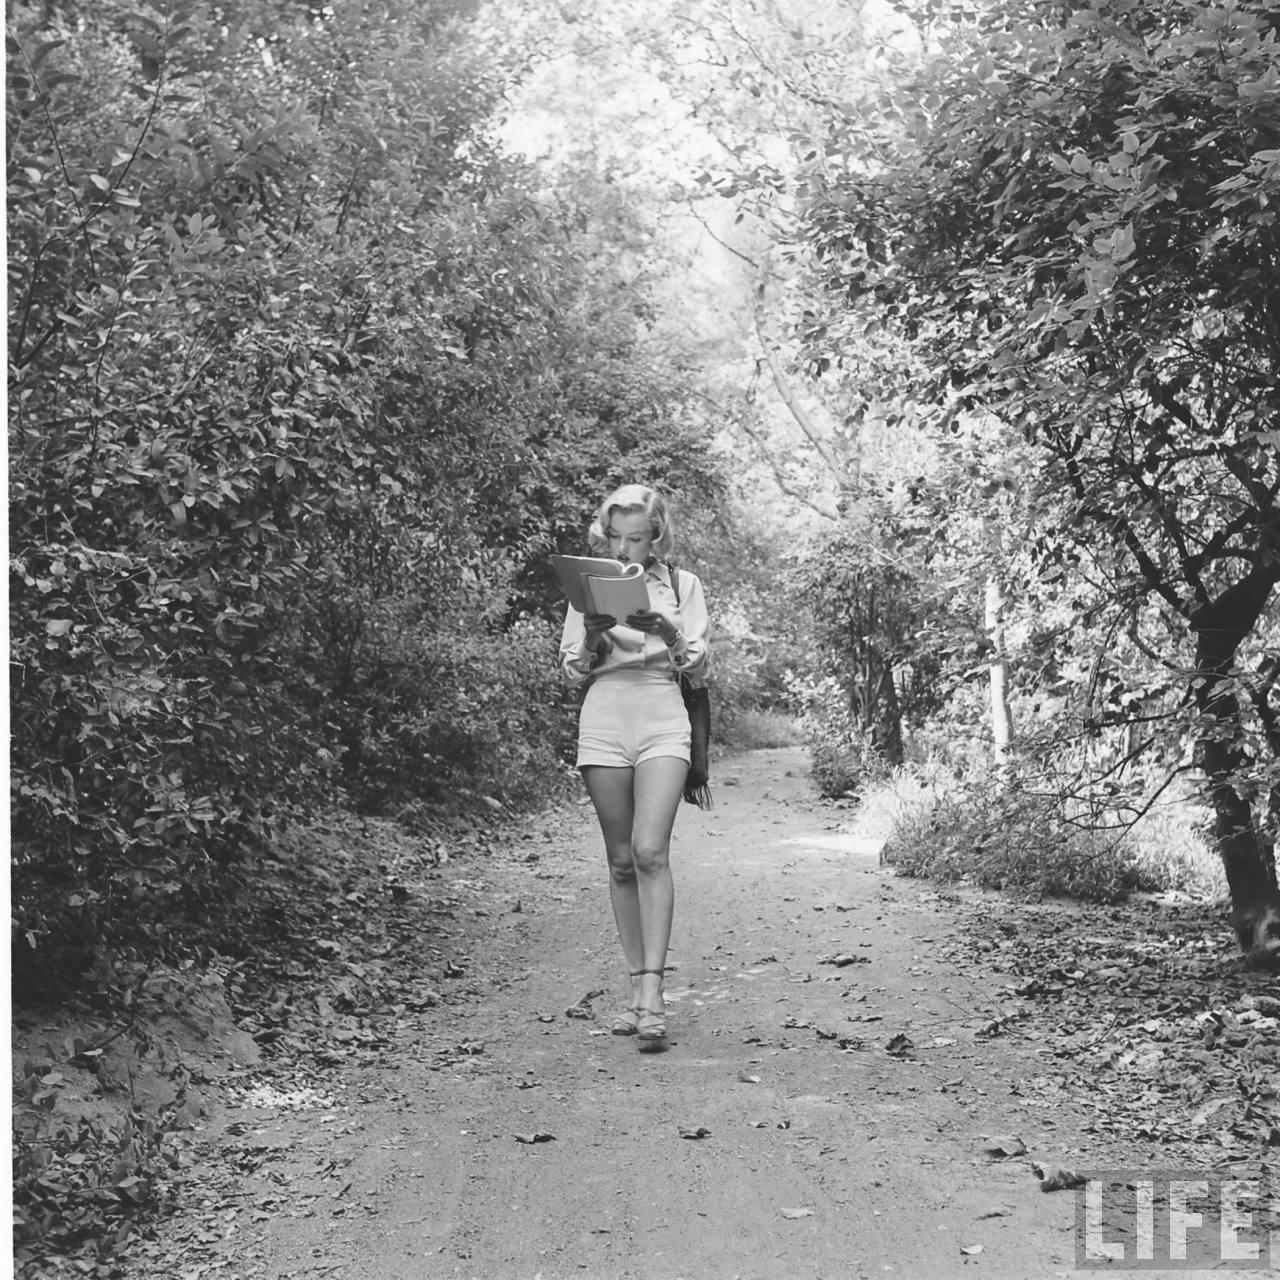 Marilyn Monroe Outdoor Photoshoot 1950 Part 3